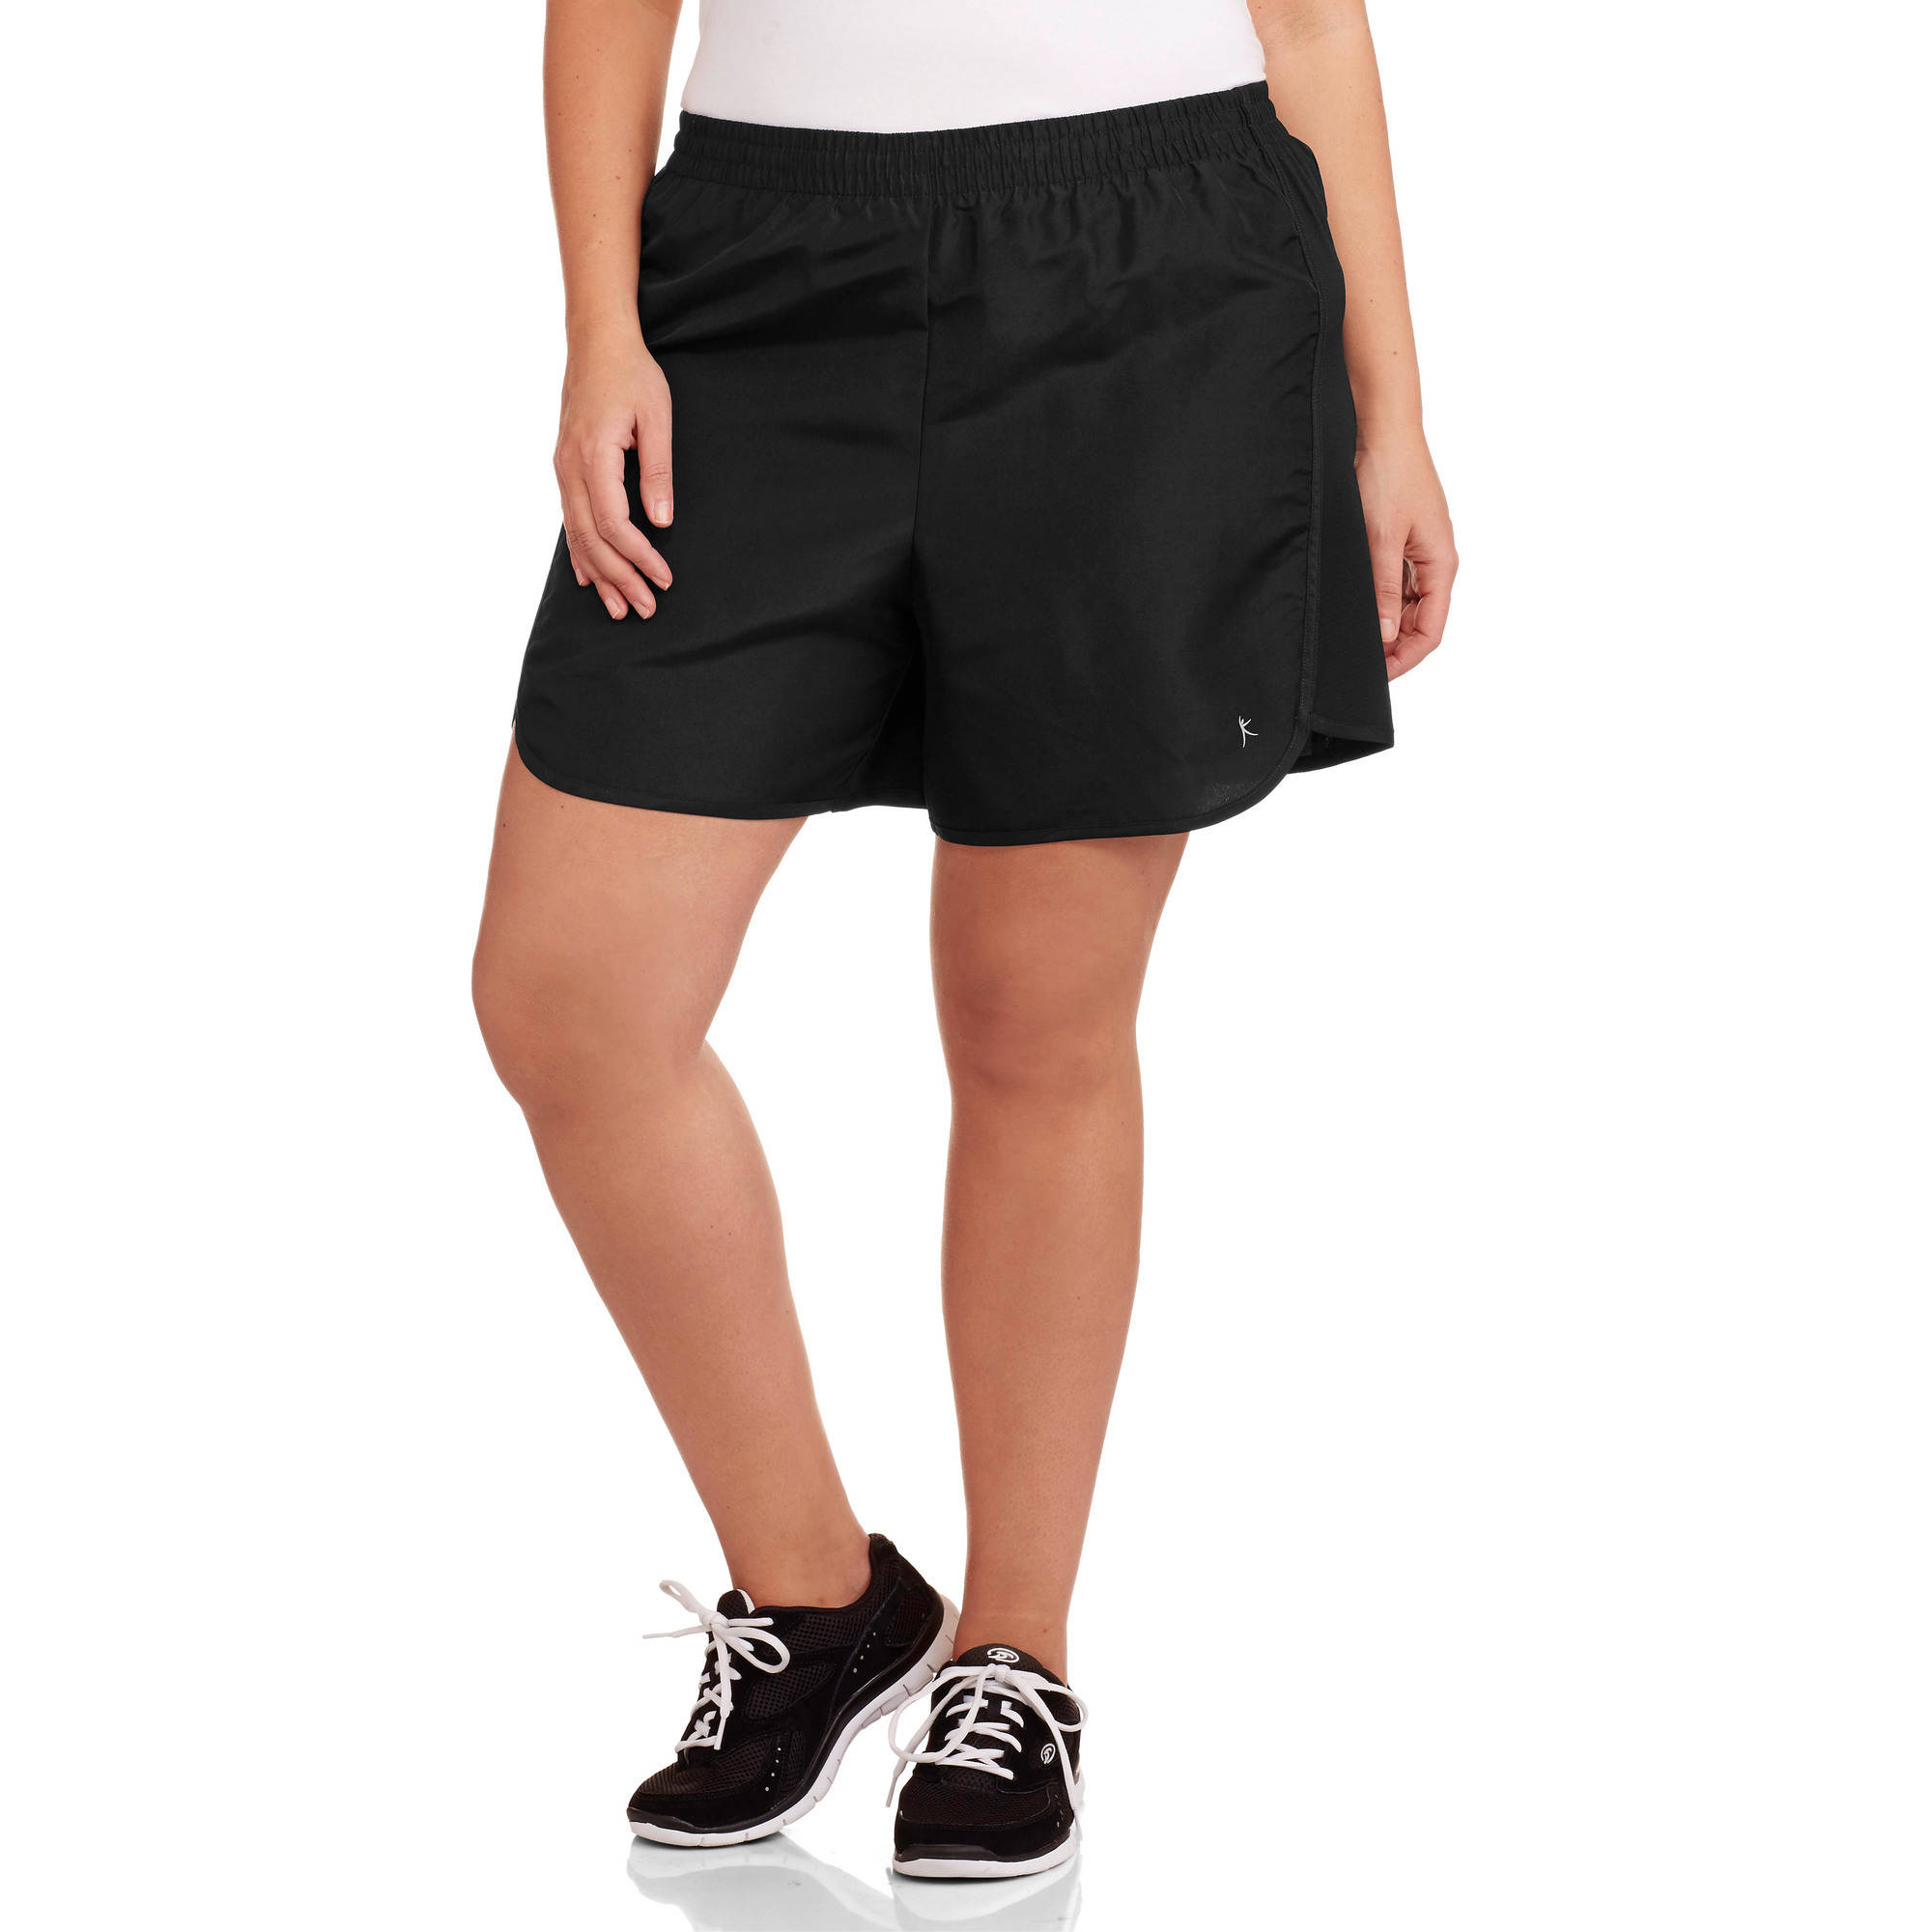 Danskin Now Women's Plus-Size Basic Running Shorts with Side Panel